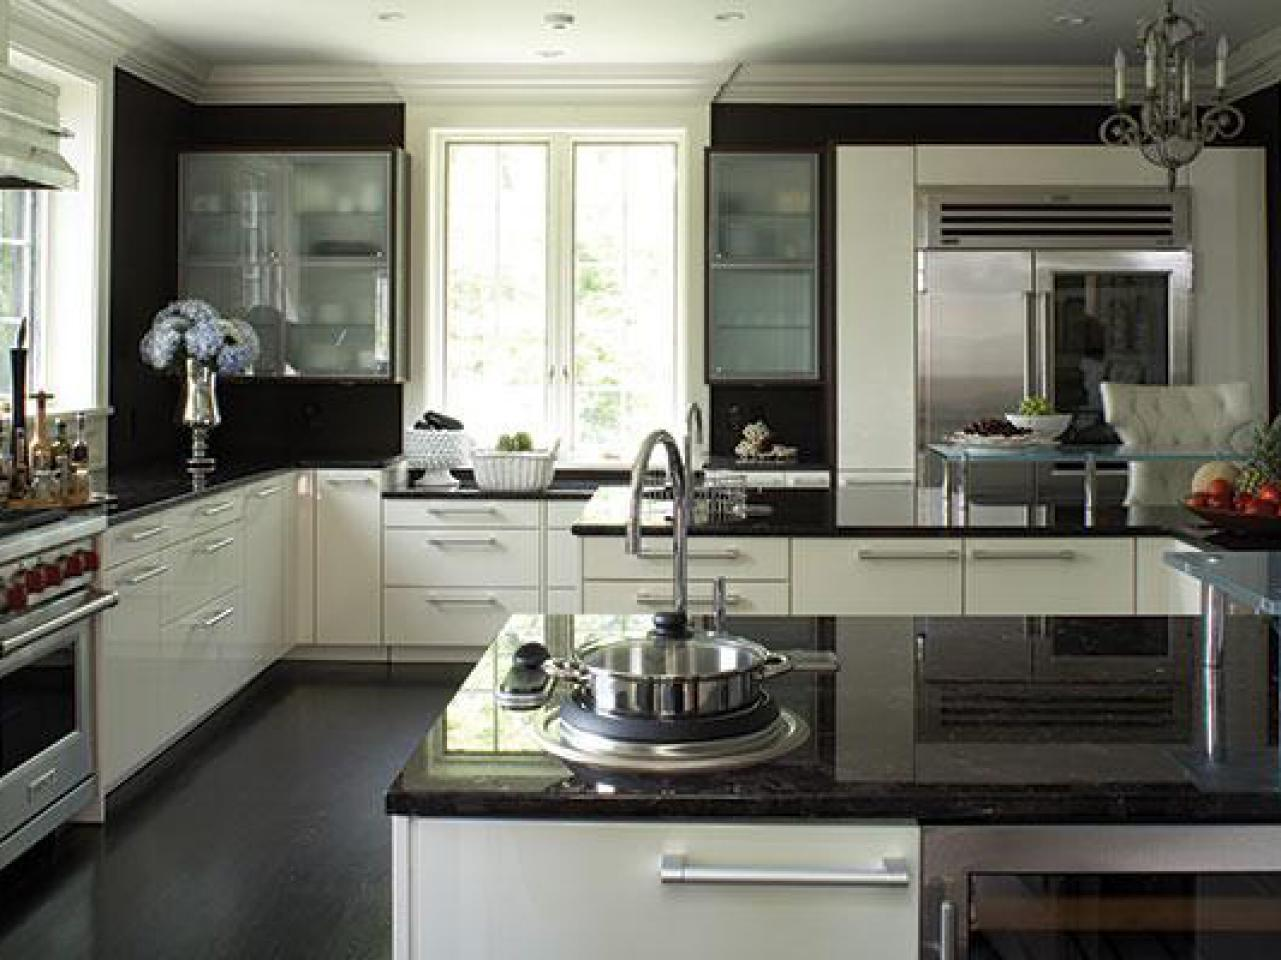 kitchen ideas white cabinets black countertop photo - 9